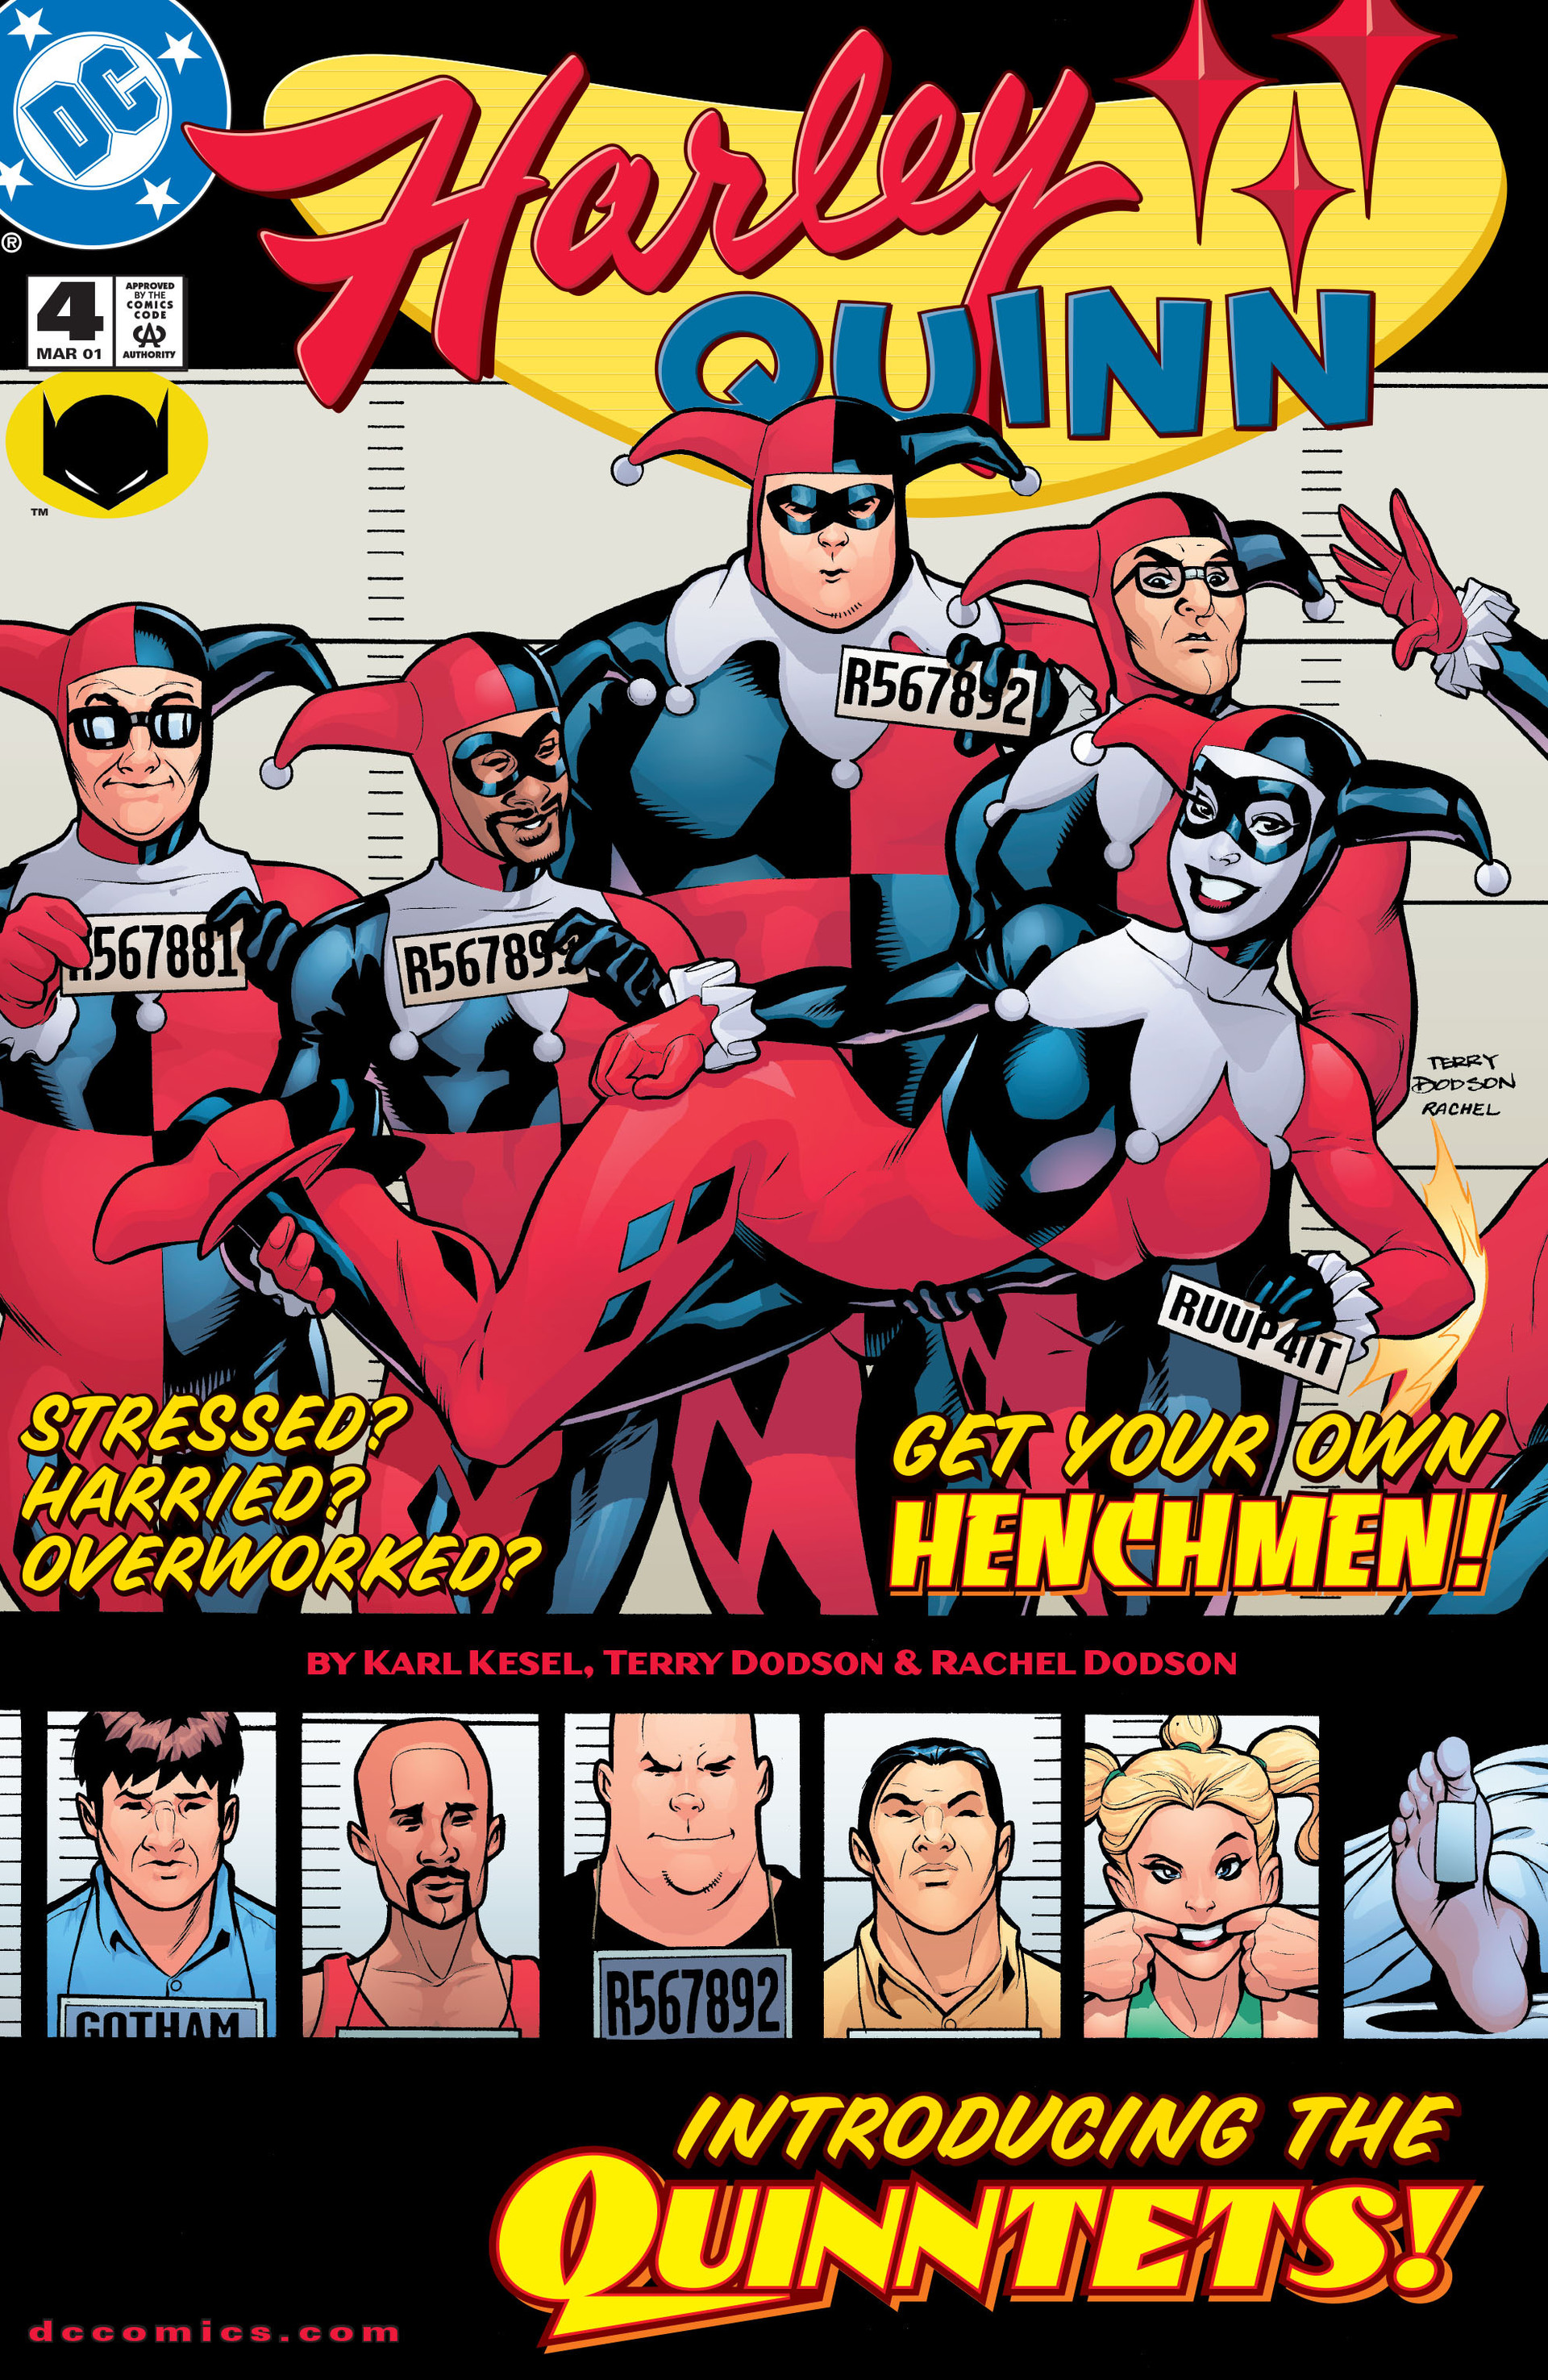 Harley Quinn Vol.1 #4